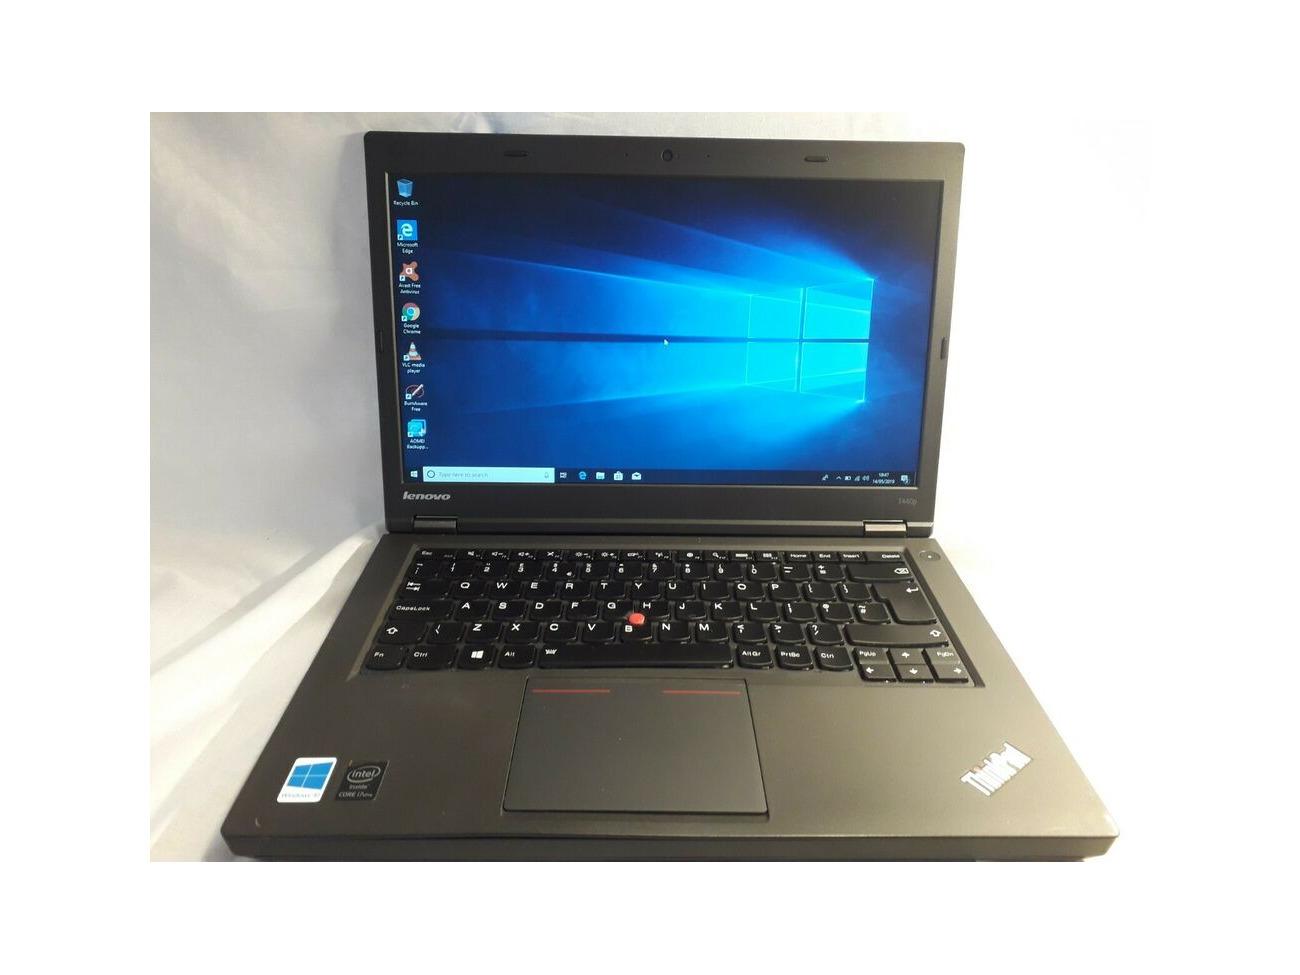 Buy 4th Gen Core i7 Lenovo Thinkpad T440p Laptop  2 9ghz